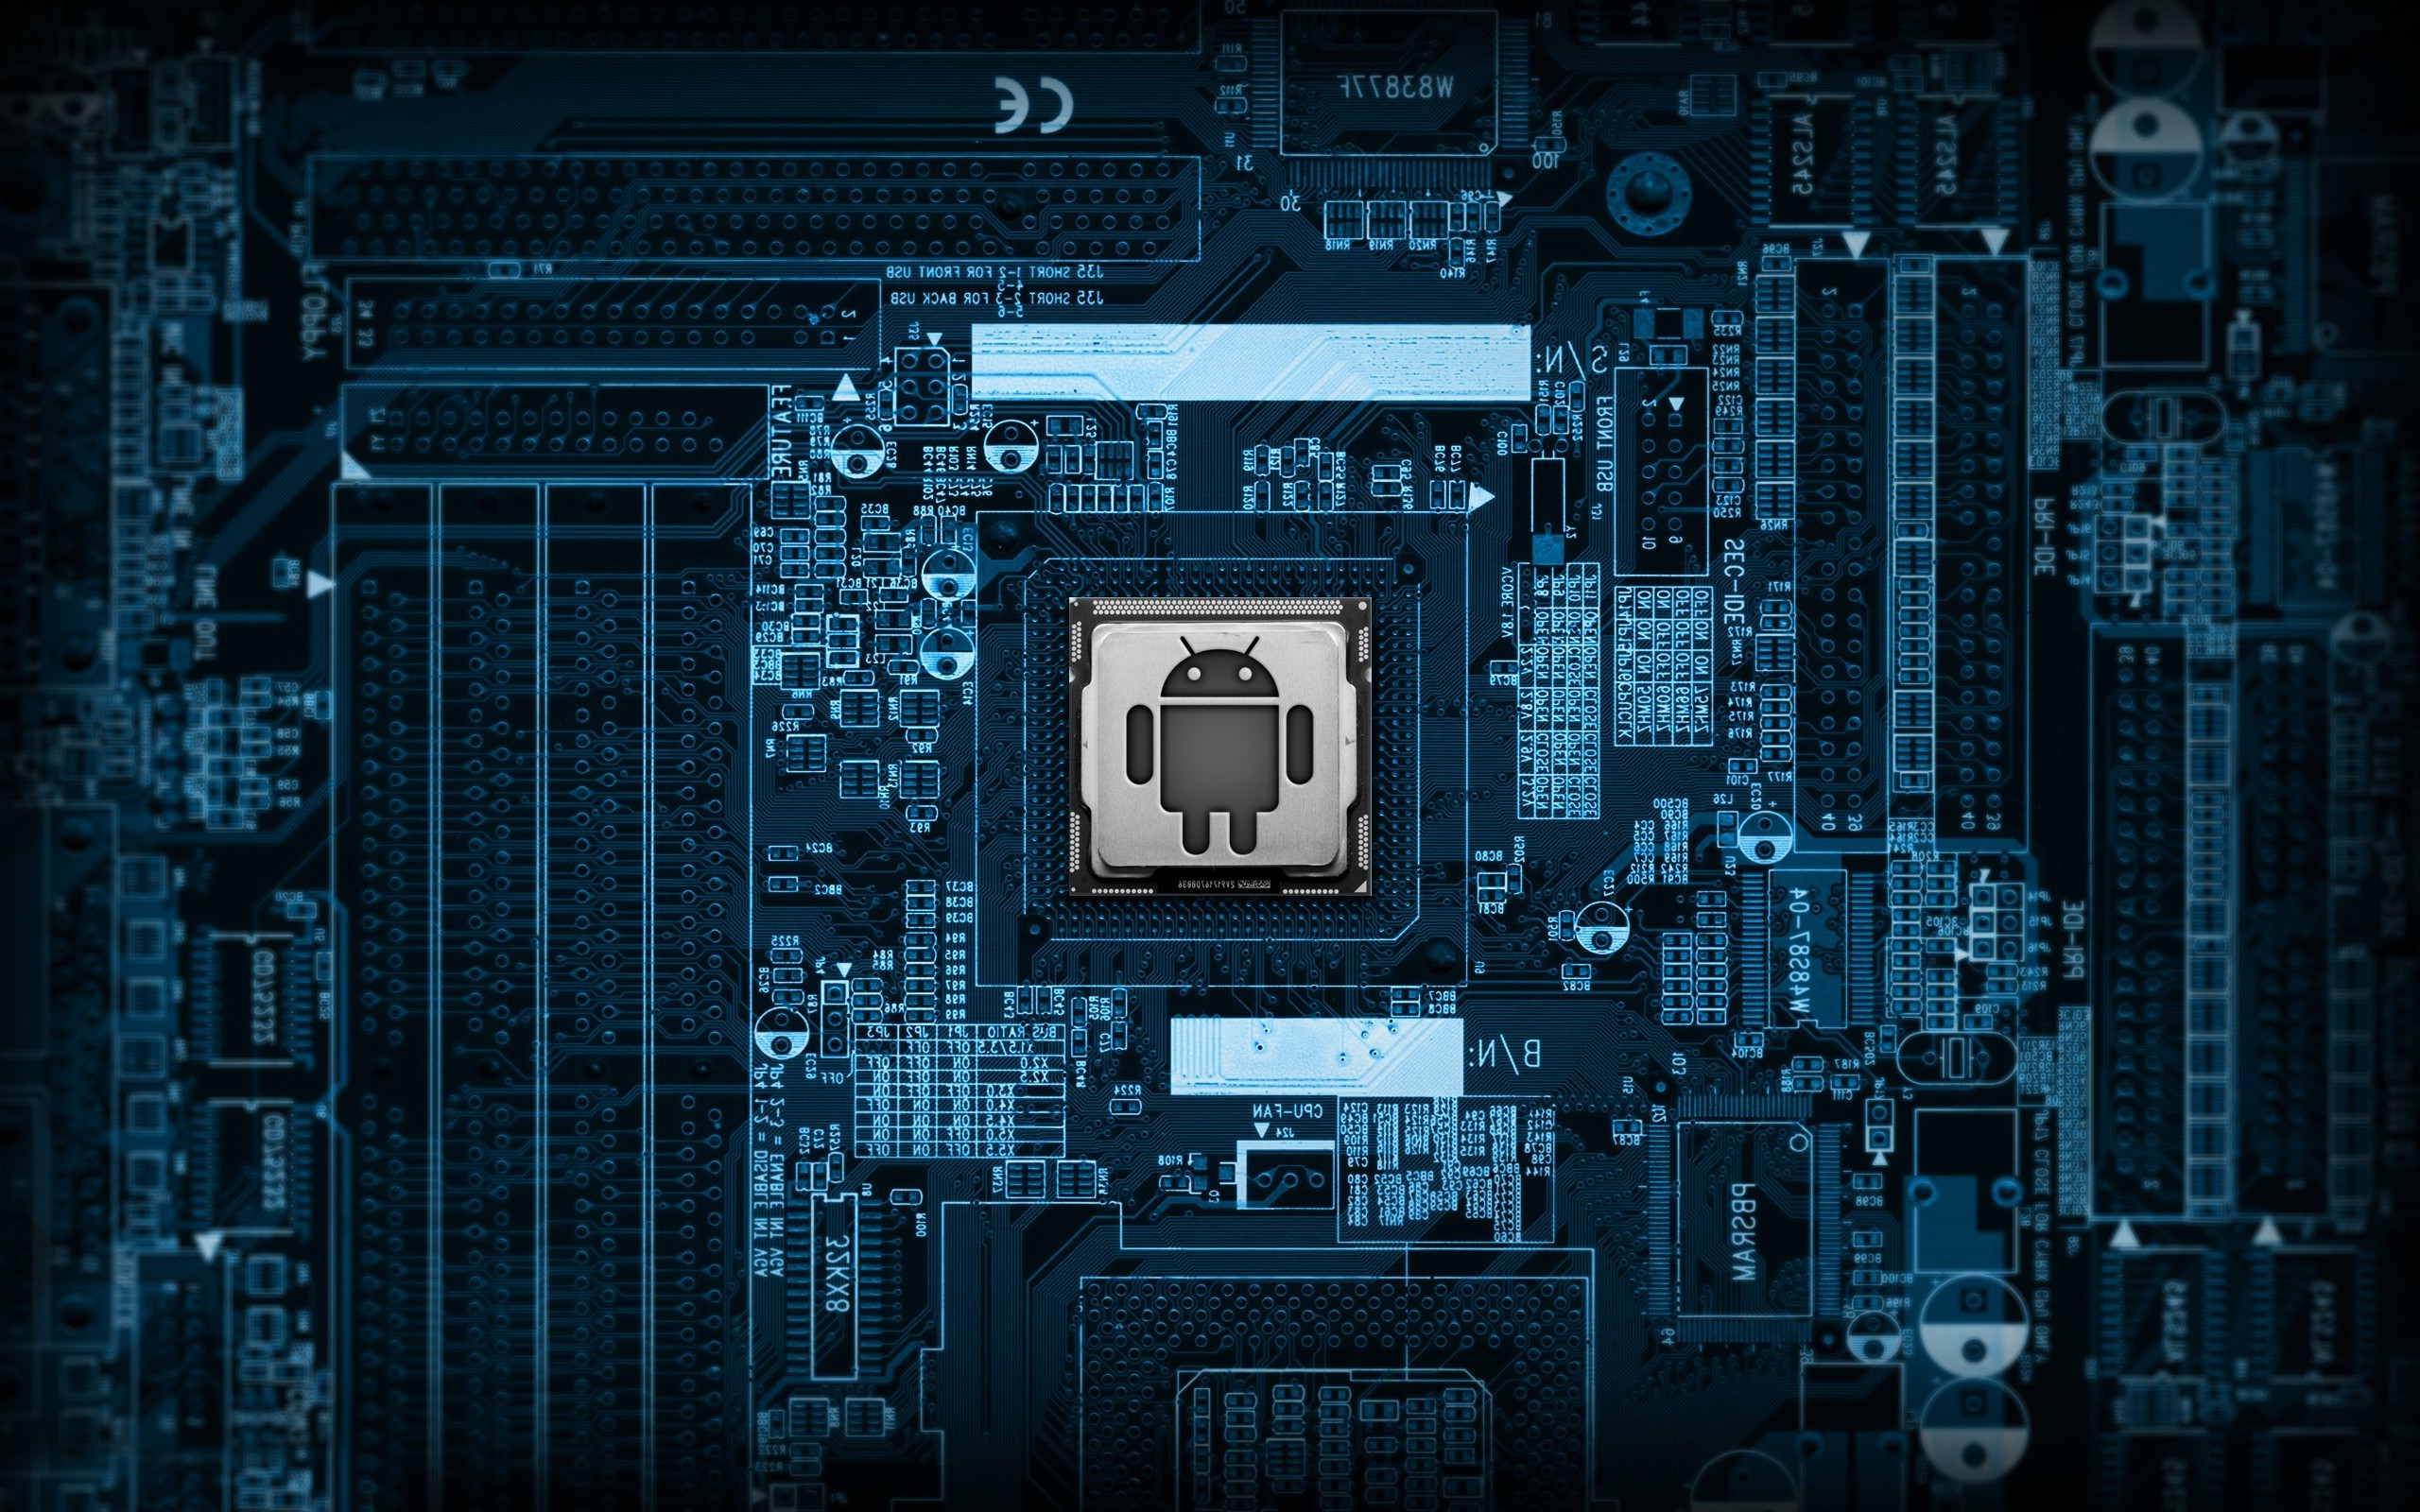 2560x1600 best android wallpaper live wallpaper hd wallpaper pinterest wallpaper hd